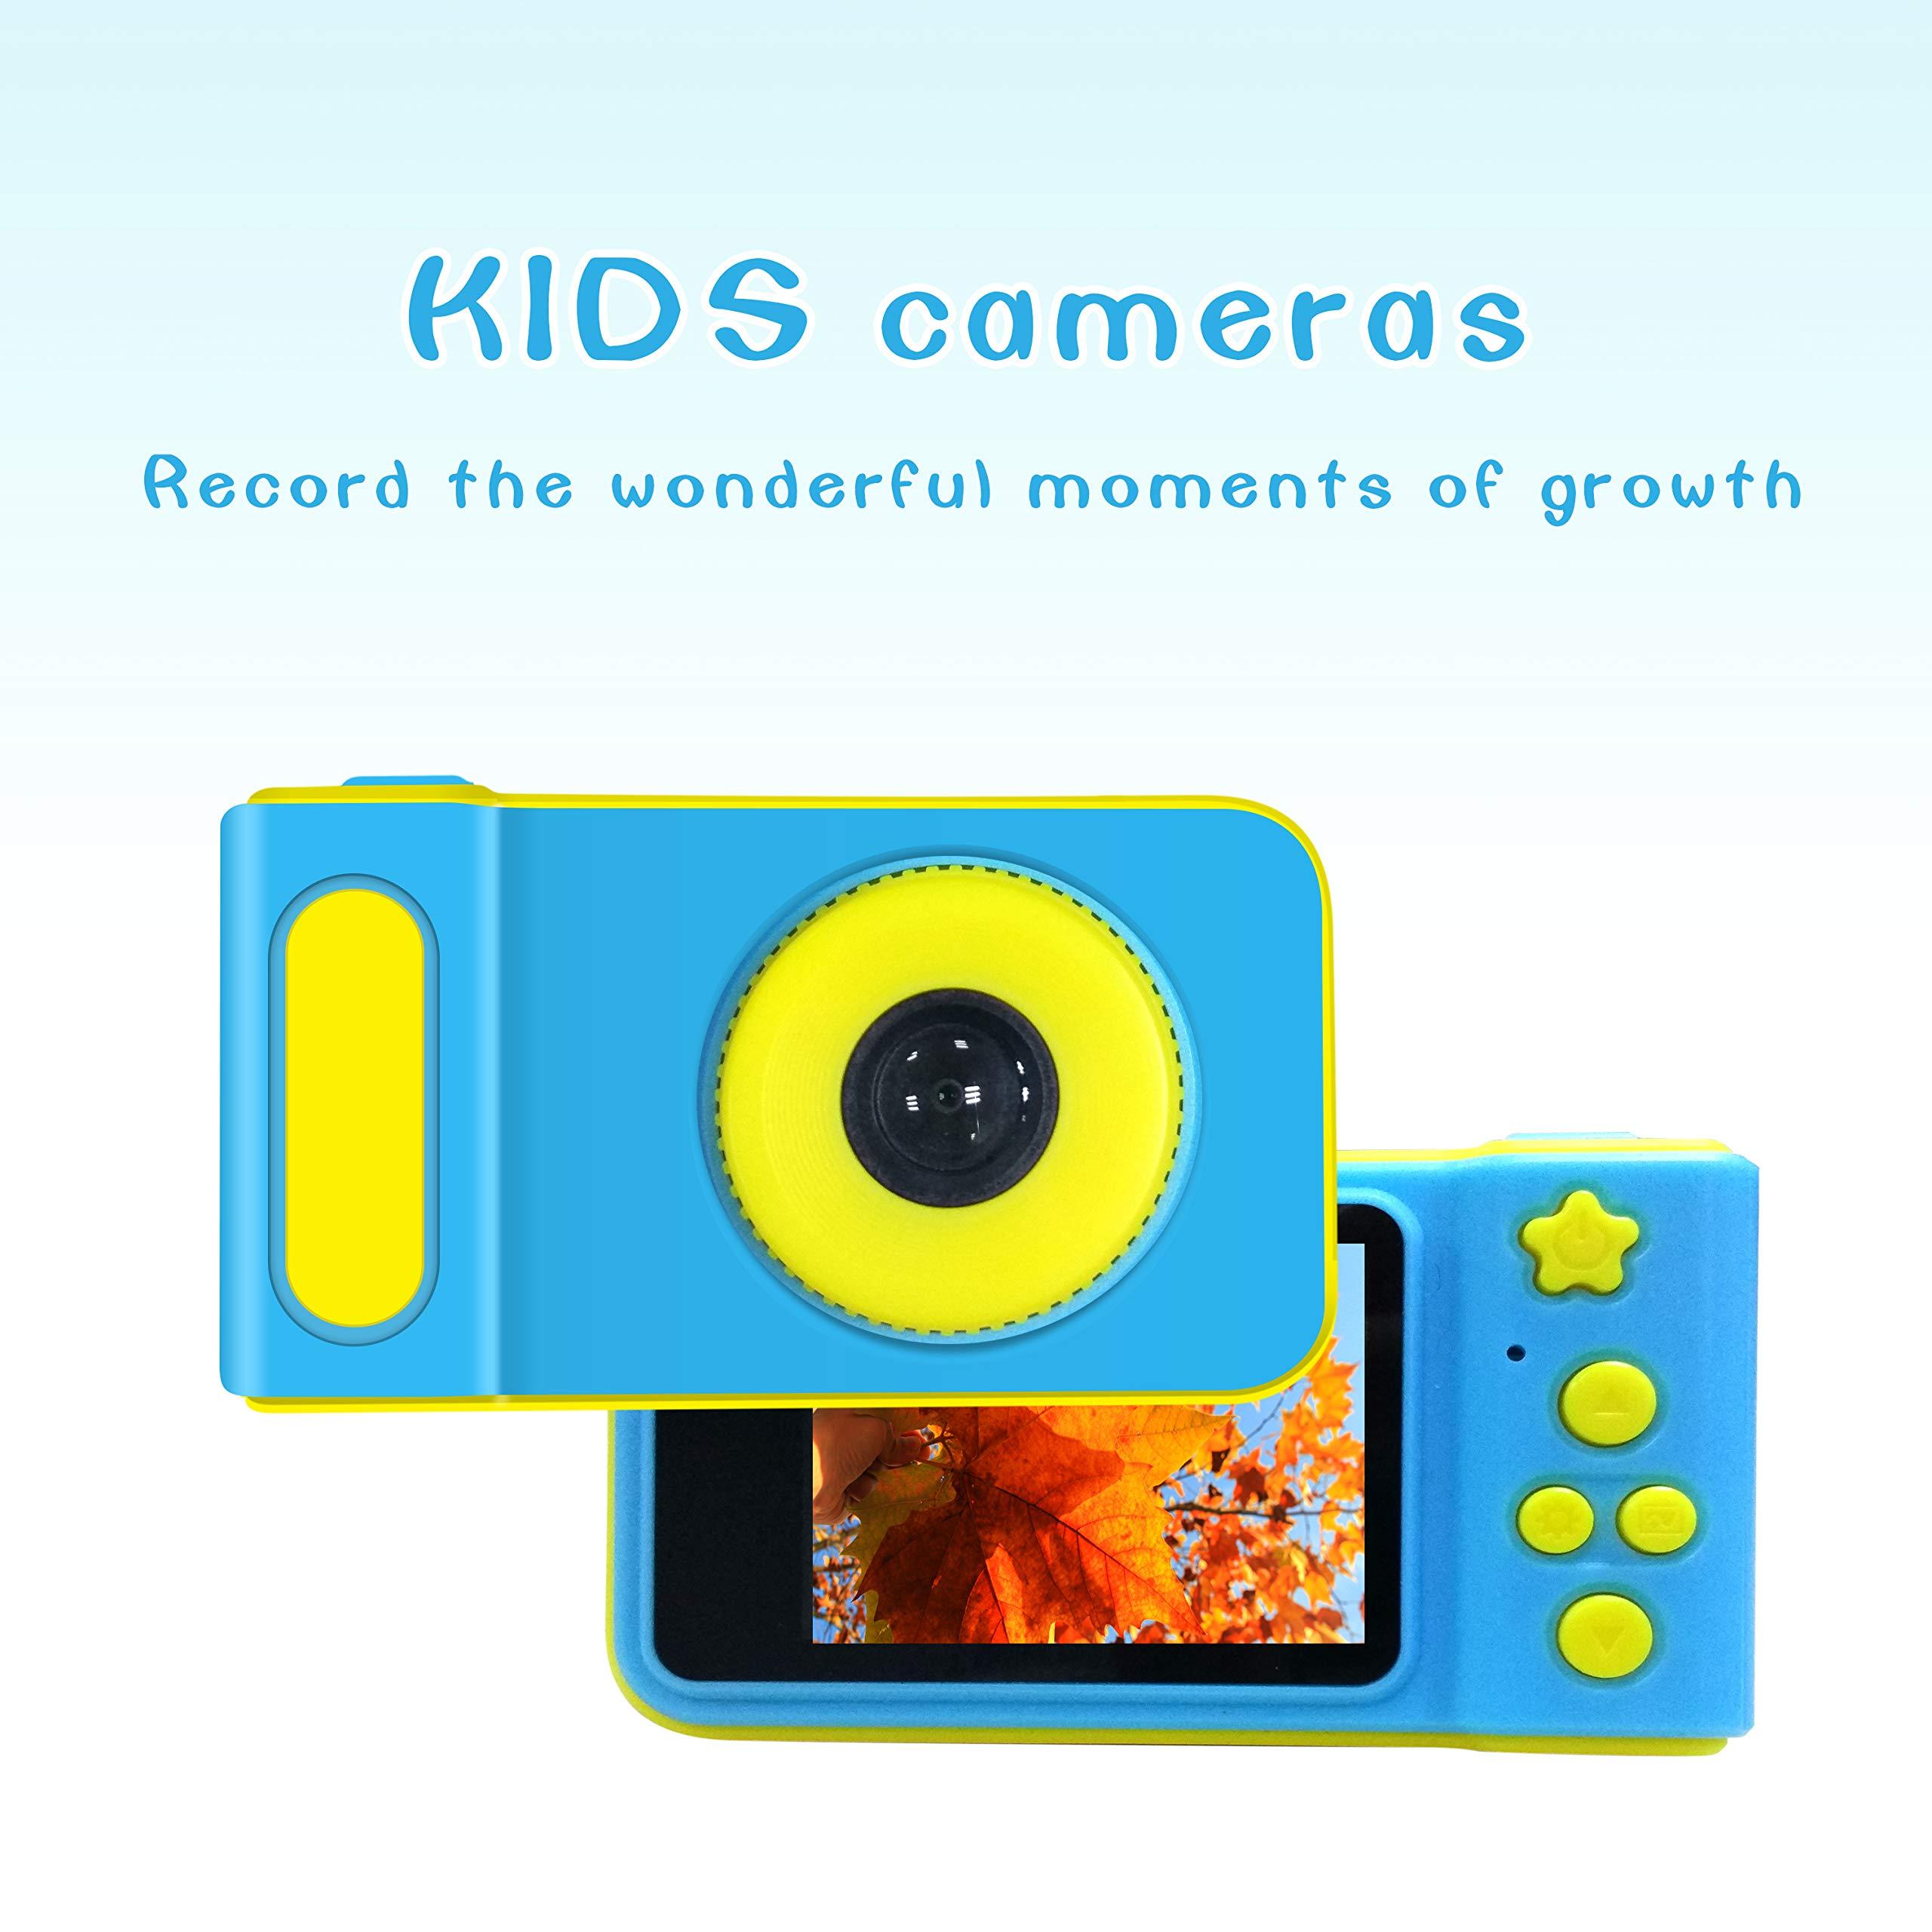 Kids Digital Camera Mini 2 Inch Screen Children Camera 1080 HD Digital Camera Free with 16G TF Card , Toys Camera for Boys Girls Birthday Gift- Blue by MJKJ (Image #1)